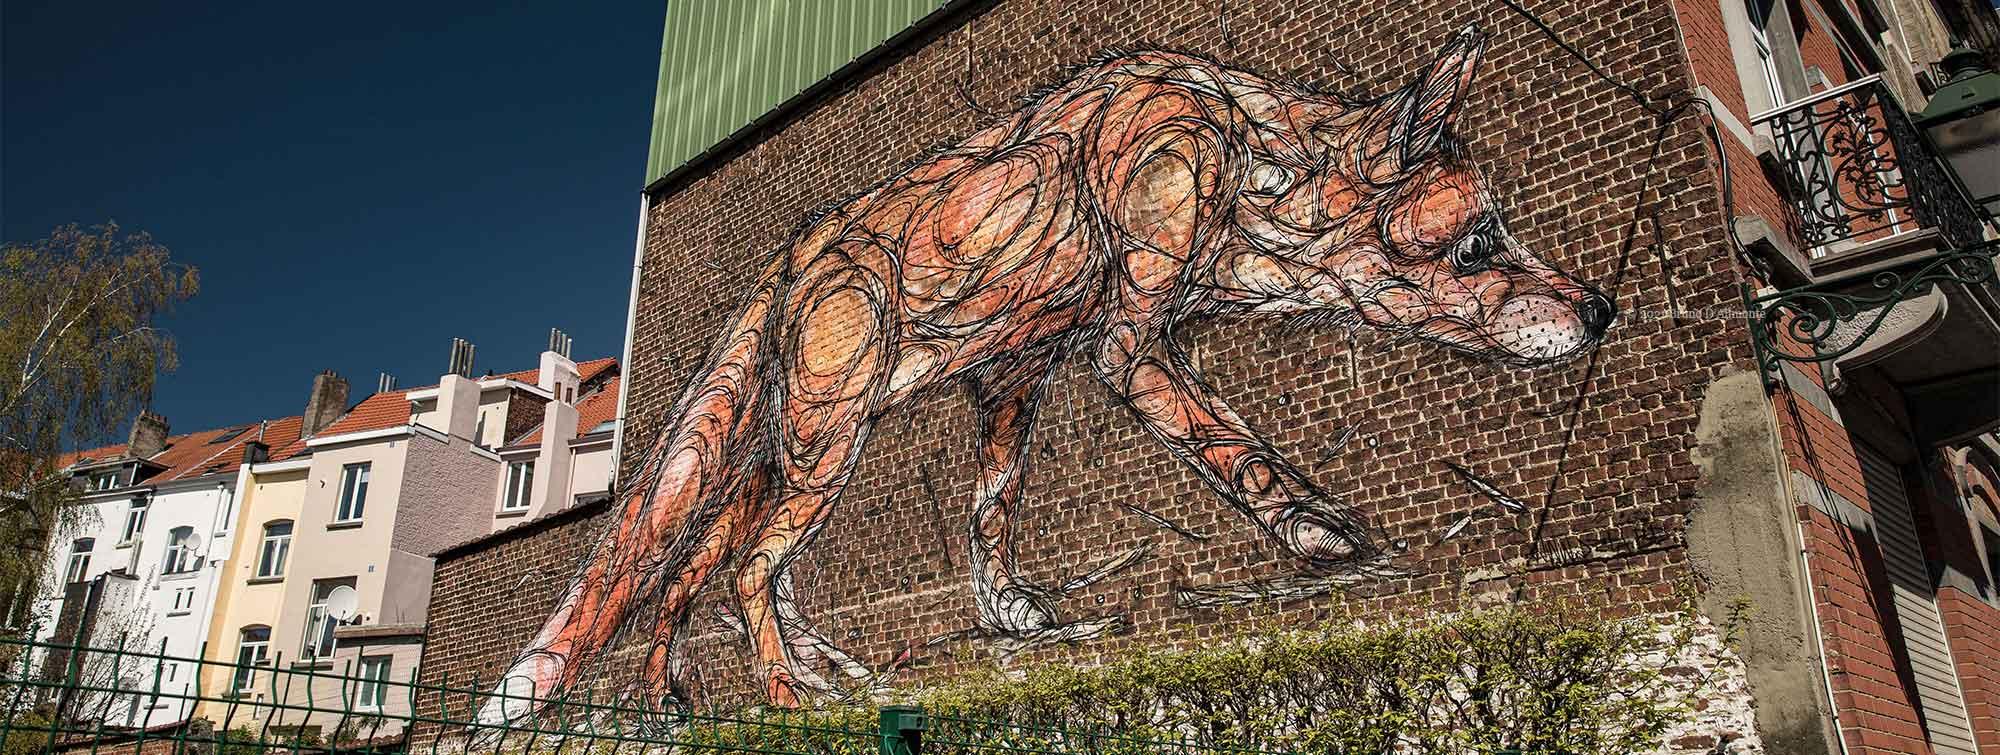 Fresque de renard street art etterbeek